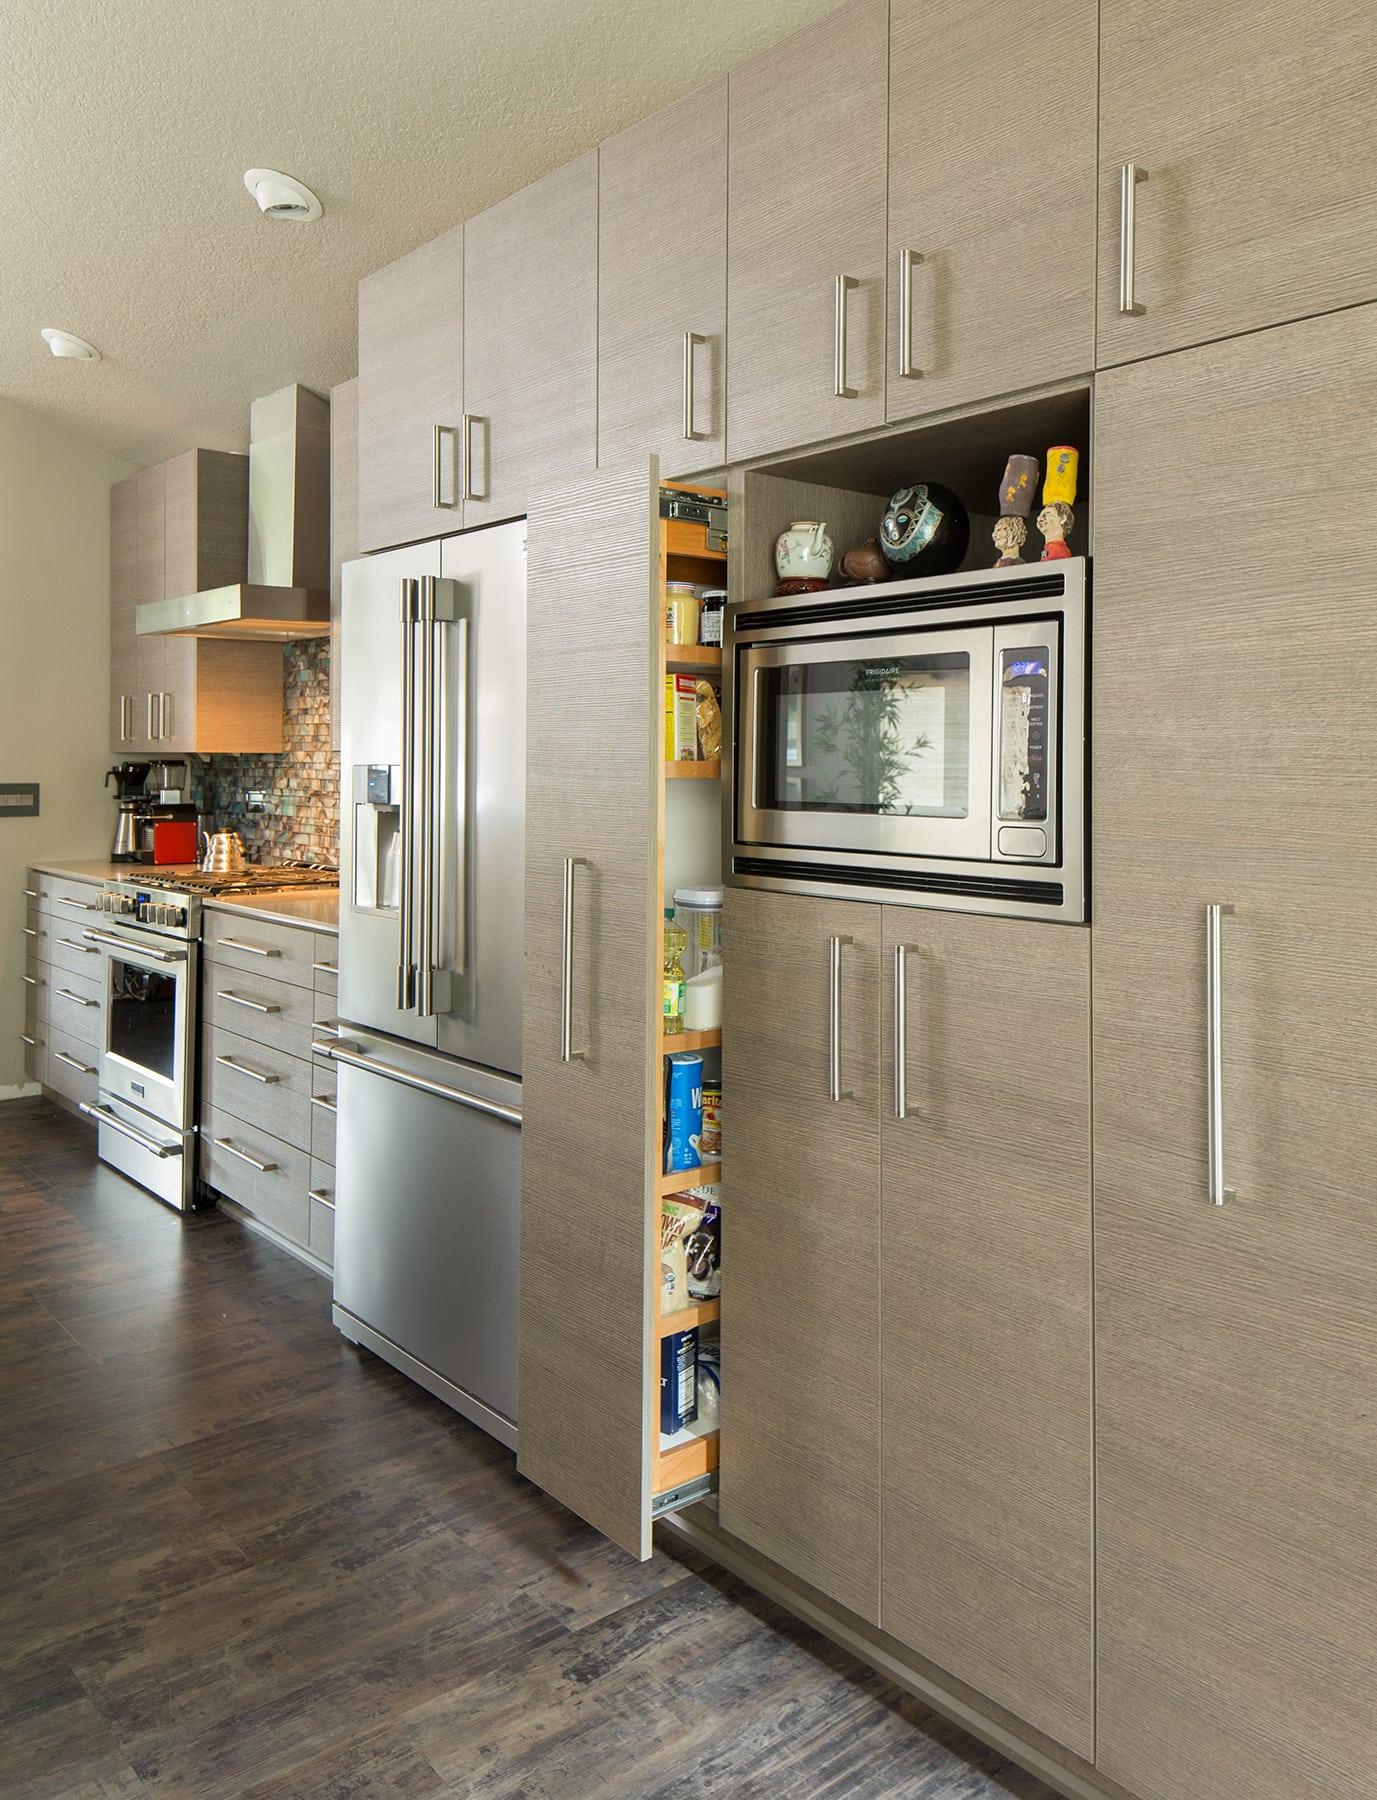 Sherwood Kitchen pantry area open